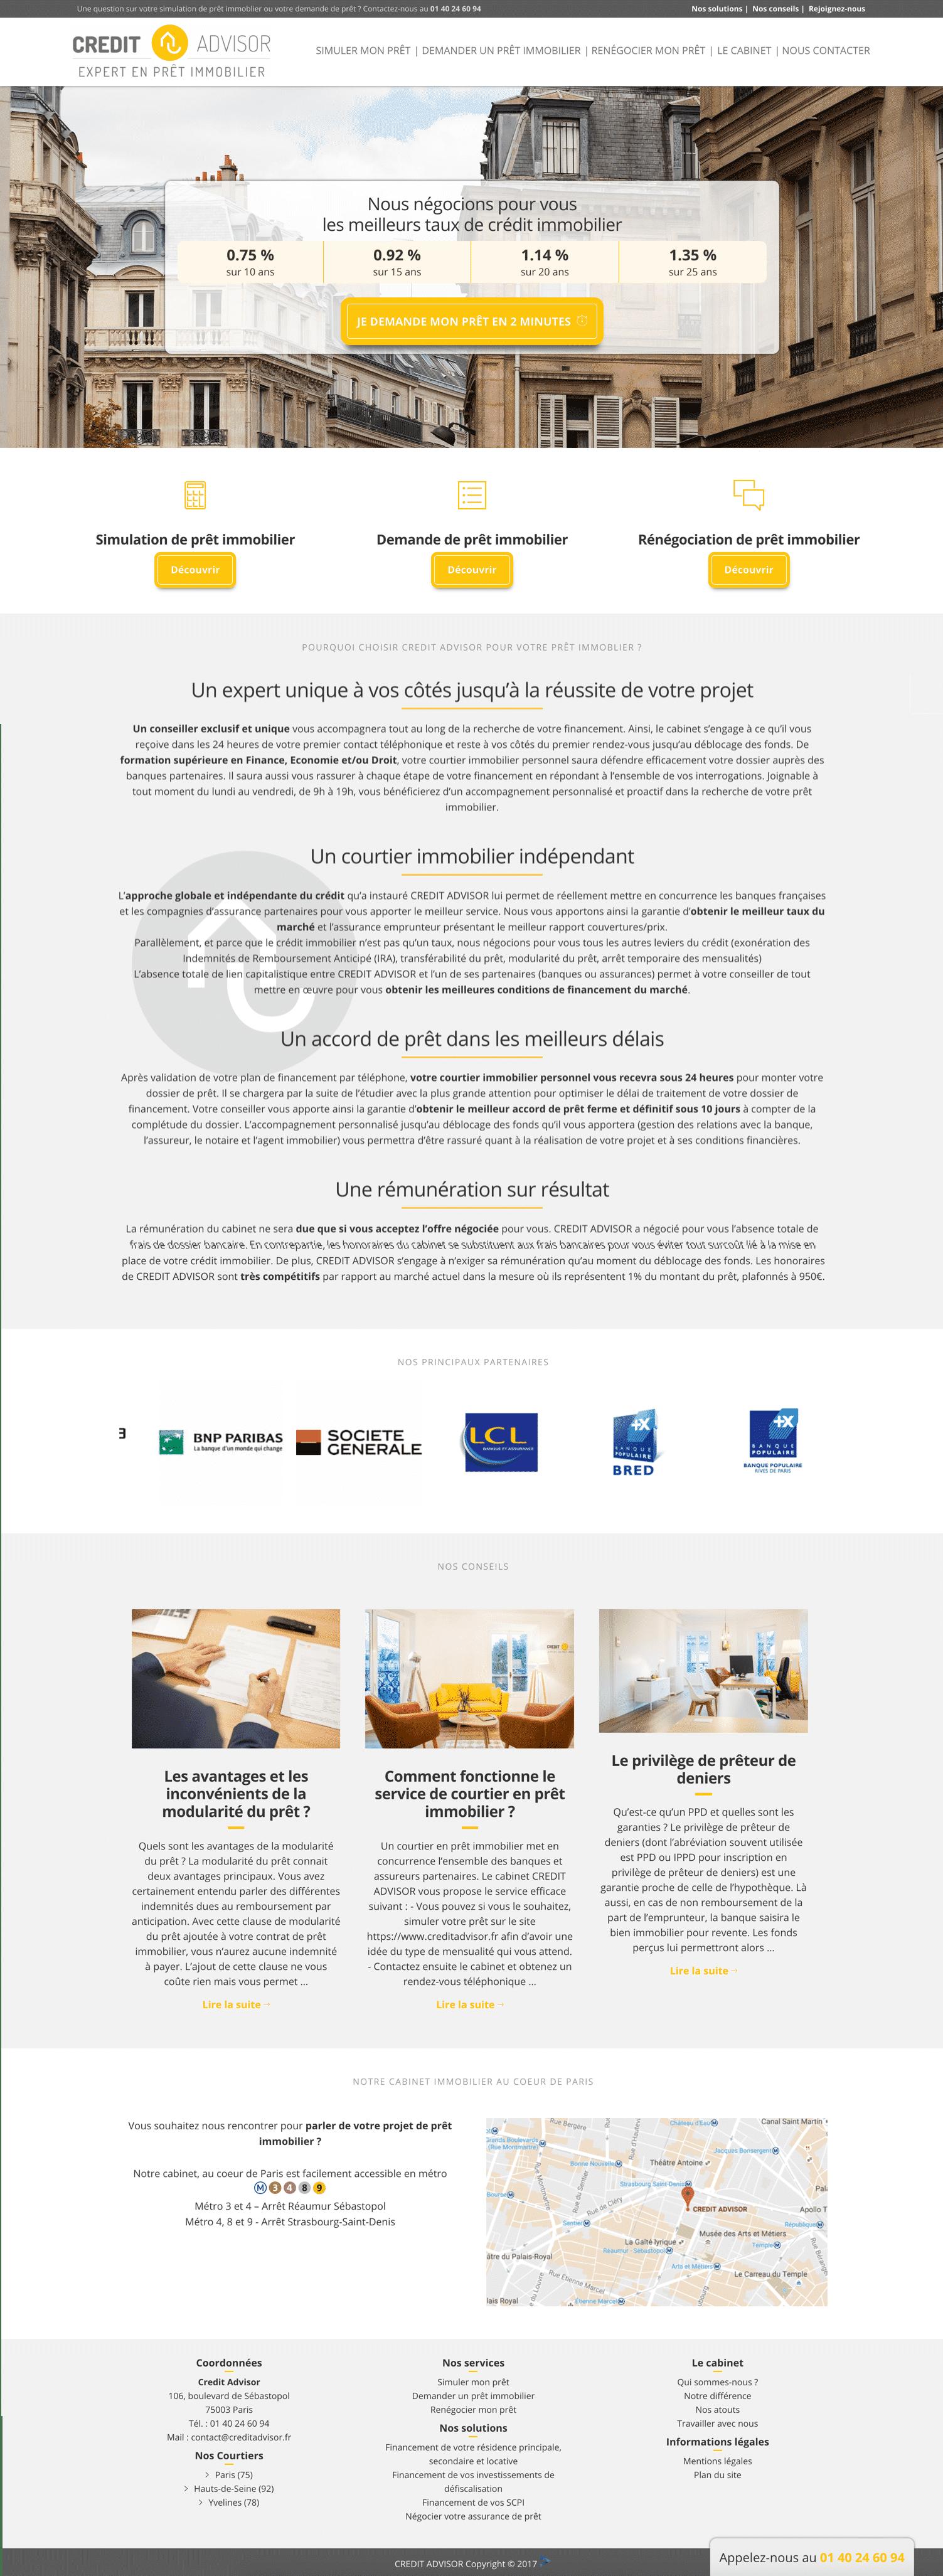 Site internet de credit advisor